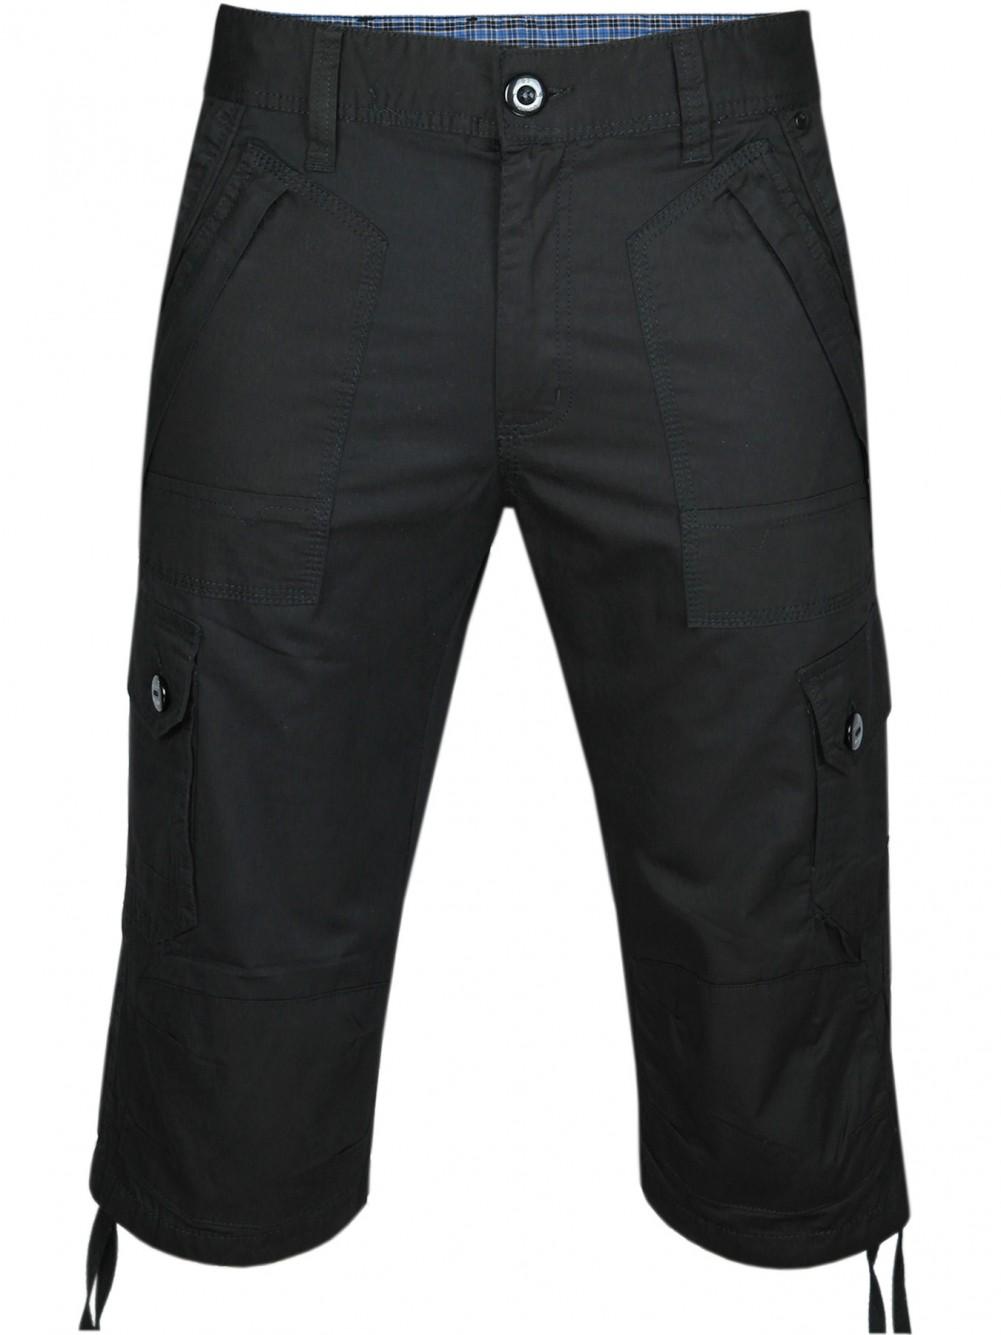 Herren Cargo-Bermudas in Capri Jeans-Style 100% Baumwolle - Schwarz